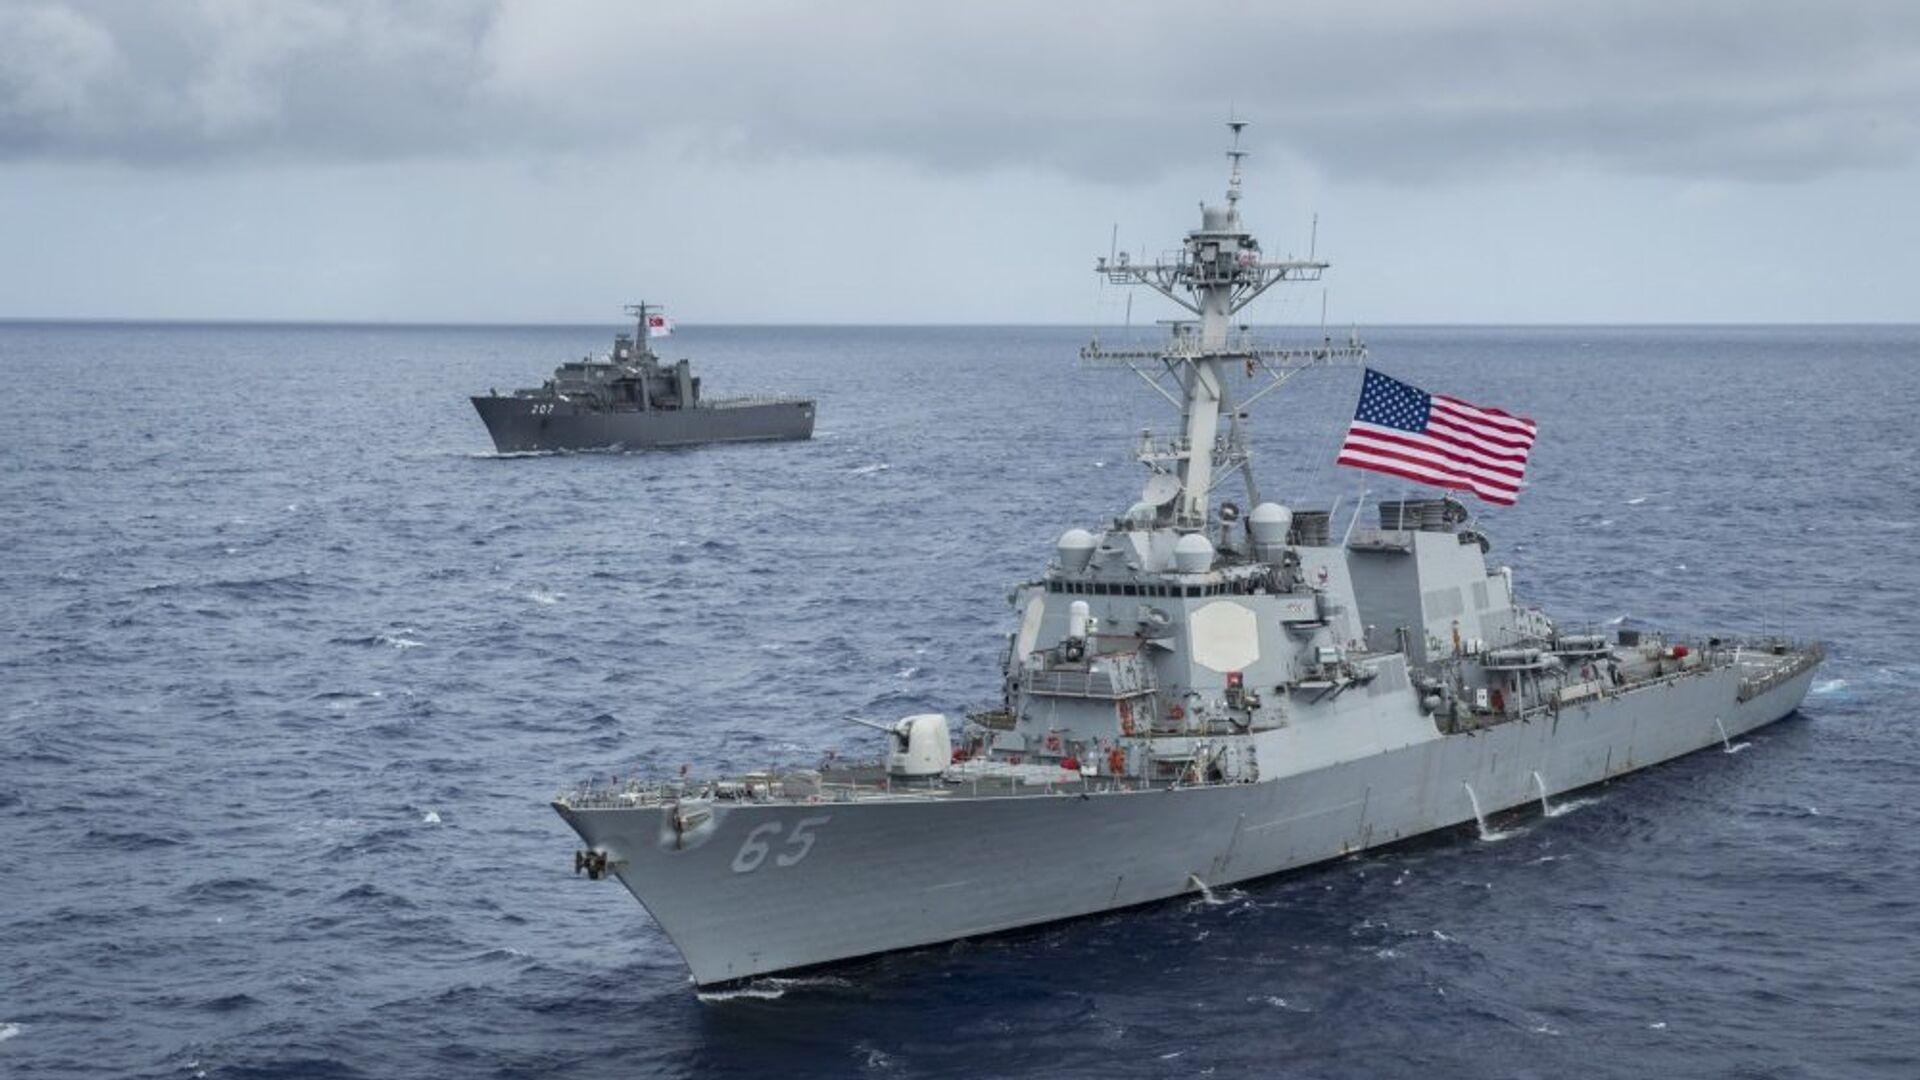 Американский эсминец USS Benfold (DDG-65) и японский буксир на учениях в заливе Сагами у восточного побережья Японии - РИА Новости, 1920, 12.07.2021